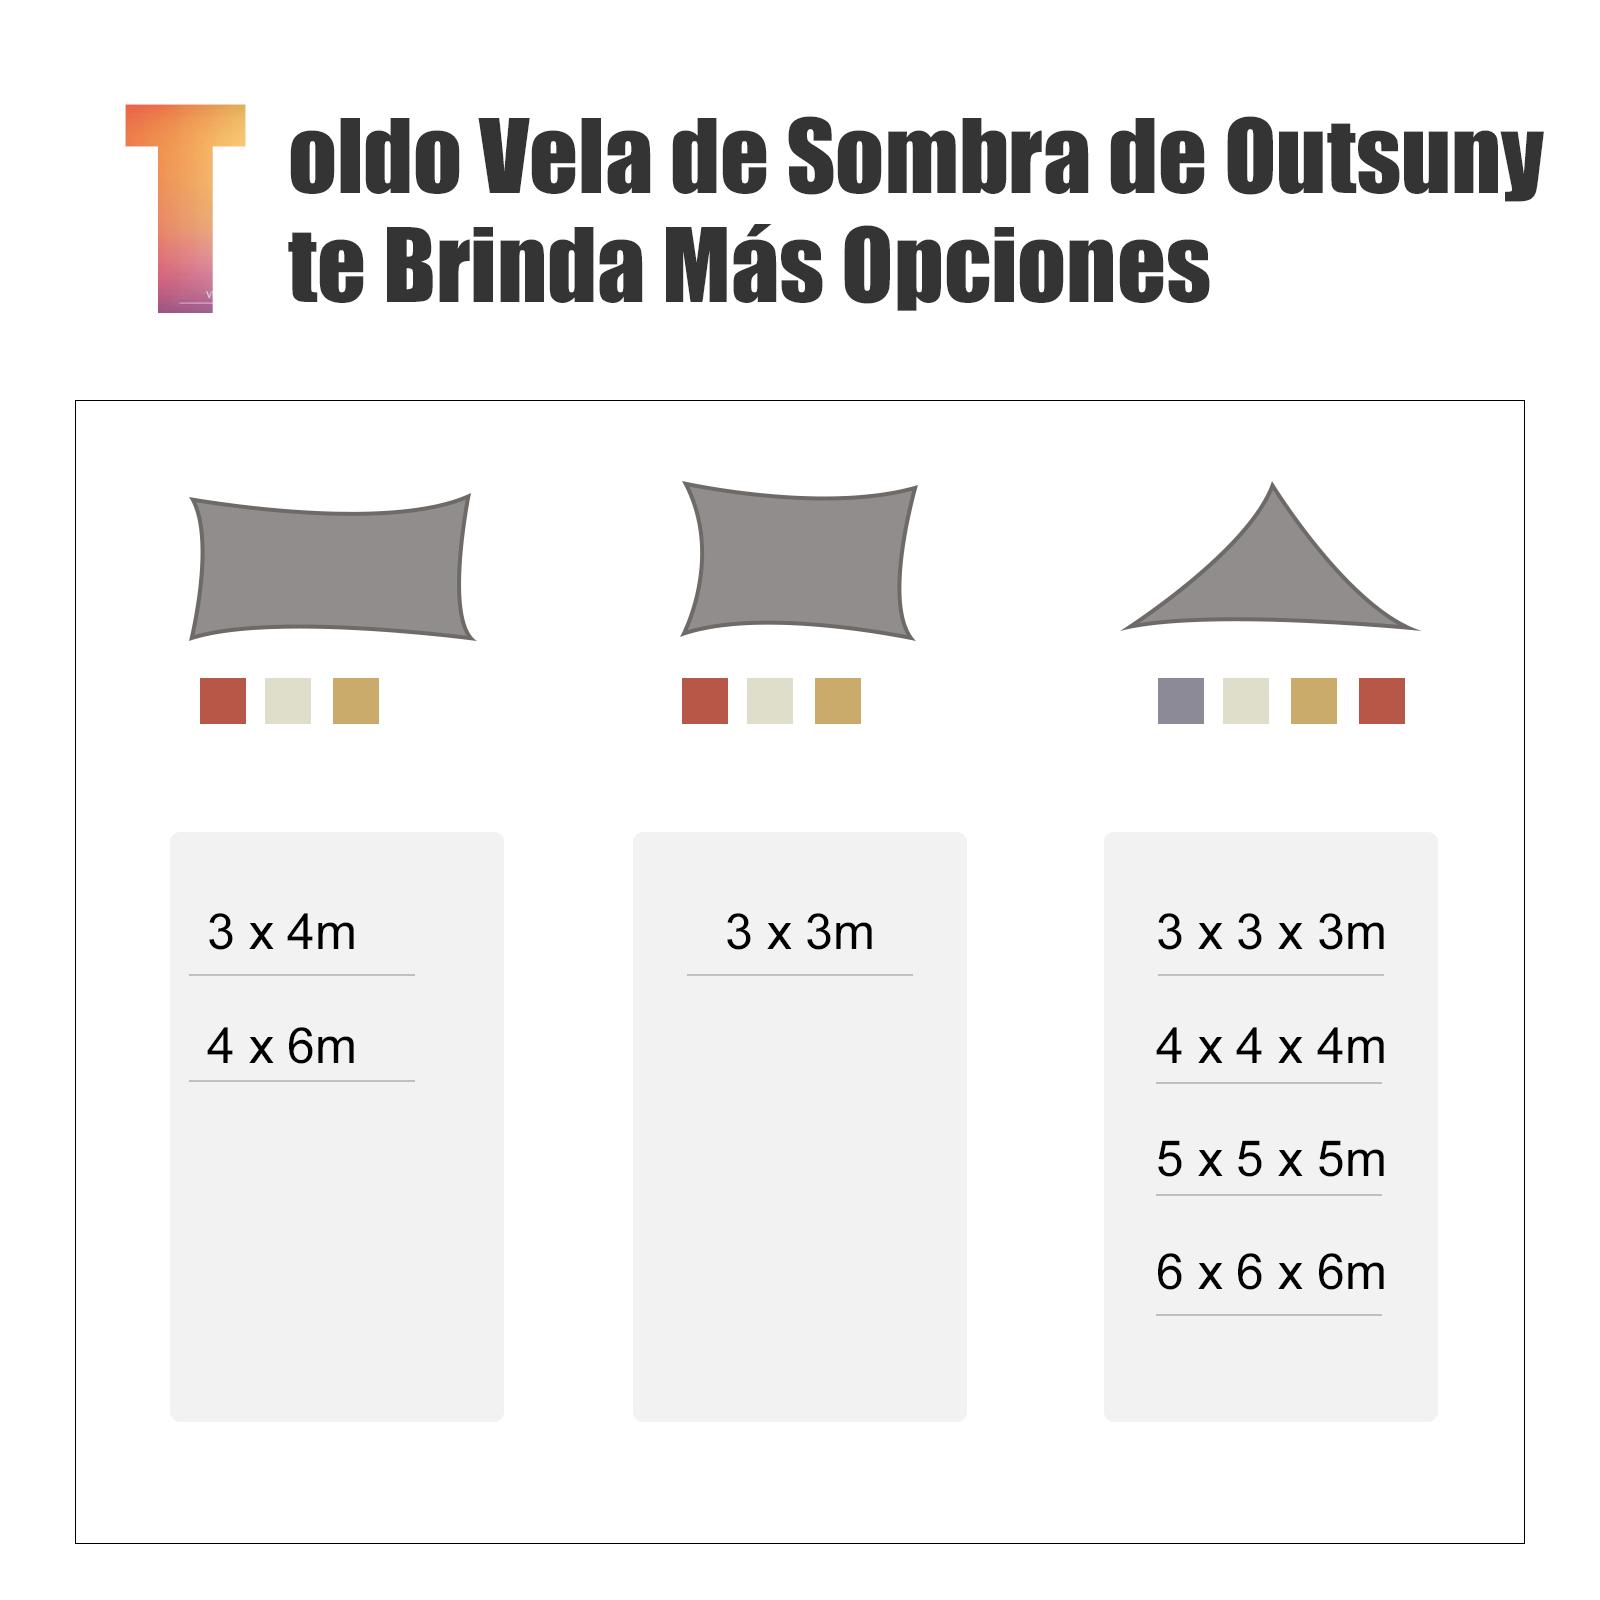 Toldo-Vela-Sombrilla-Parasol-Triangulo-Tejido-de-Poliester-185-g-m-Jardin-Playa miniatura 22